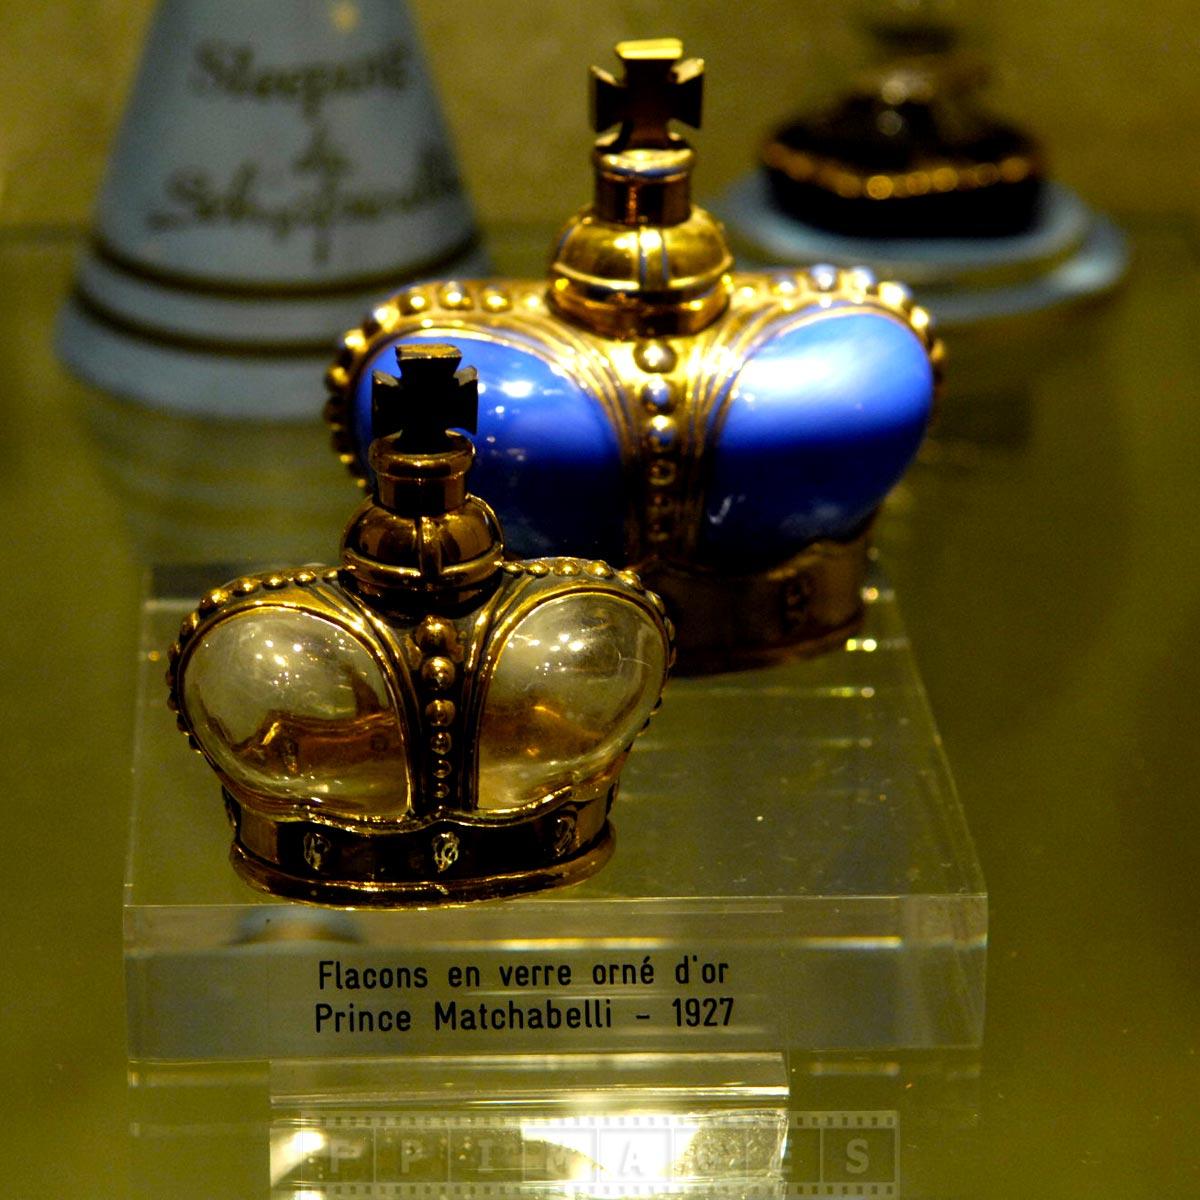 Elegant perfume bottles of Prince Matchabelli perfume line circa 1927